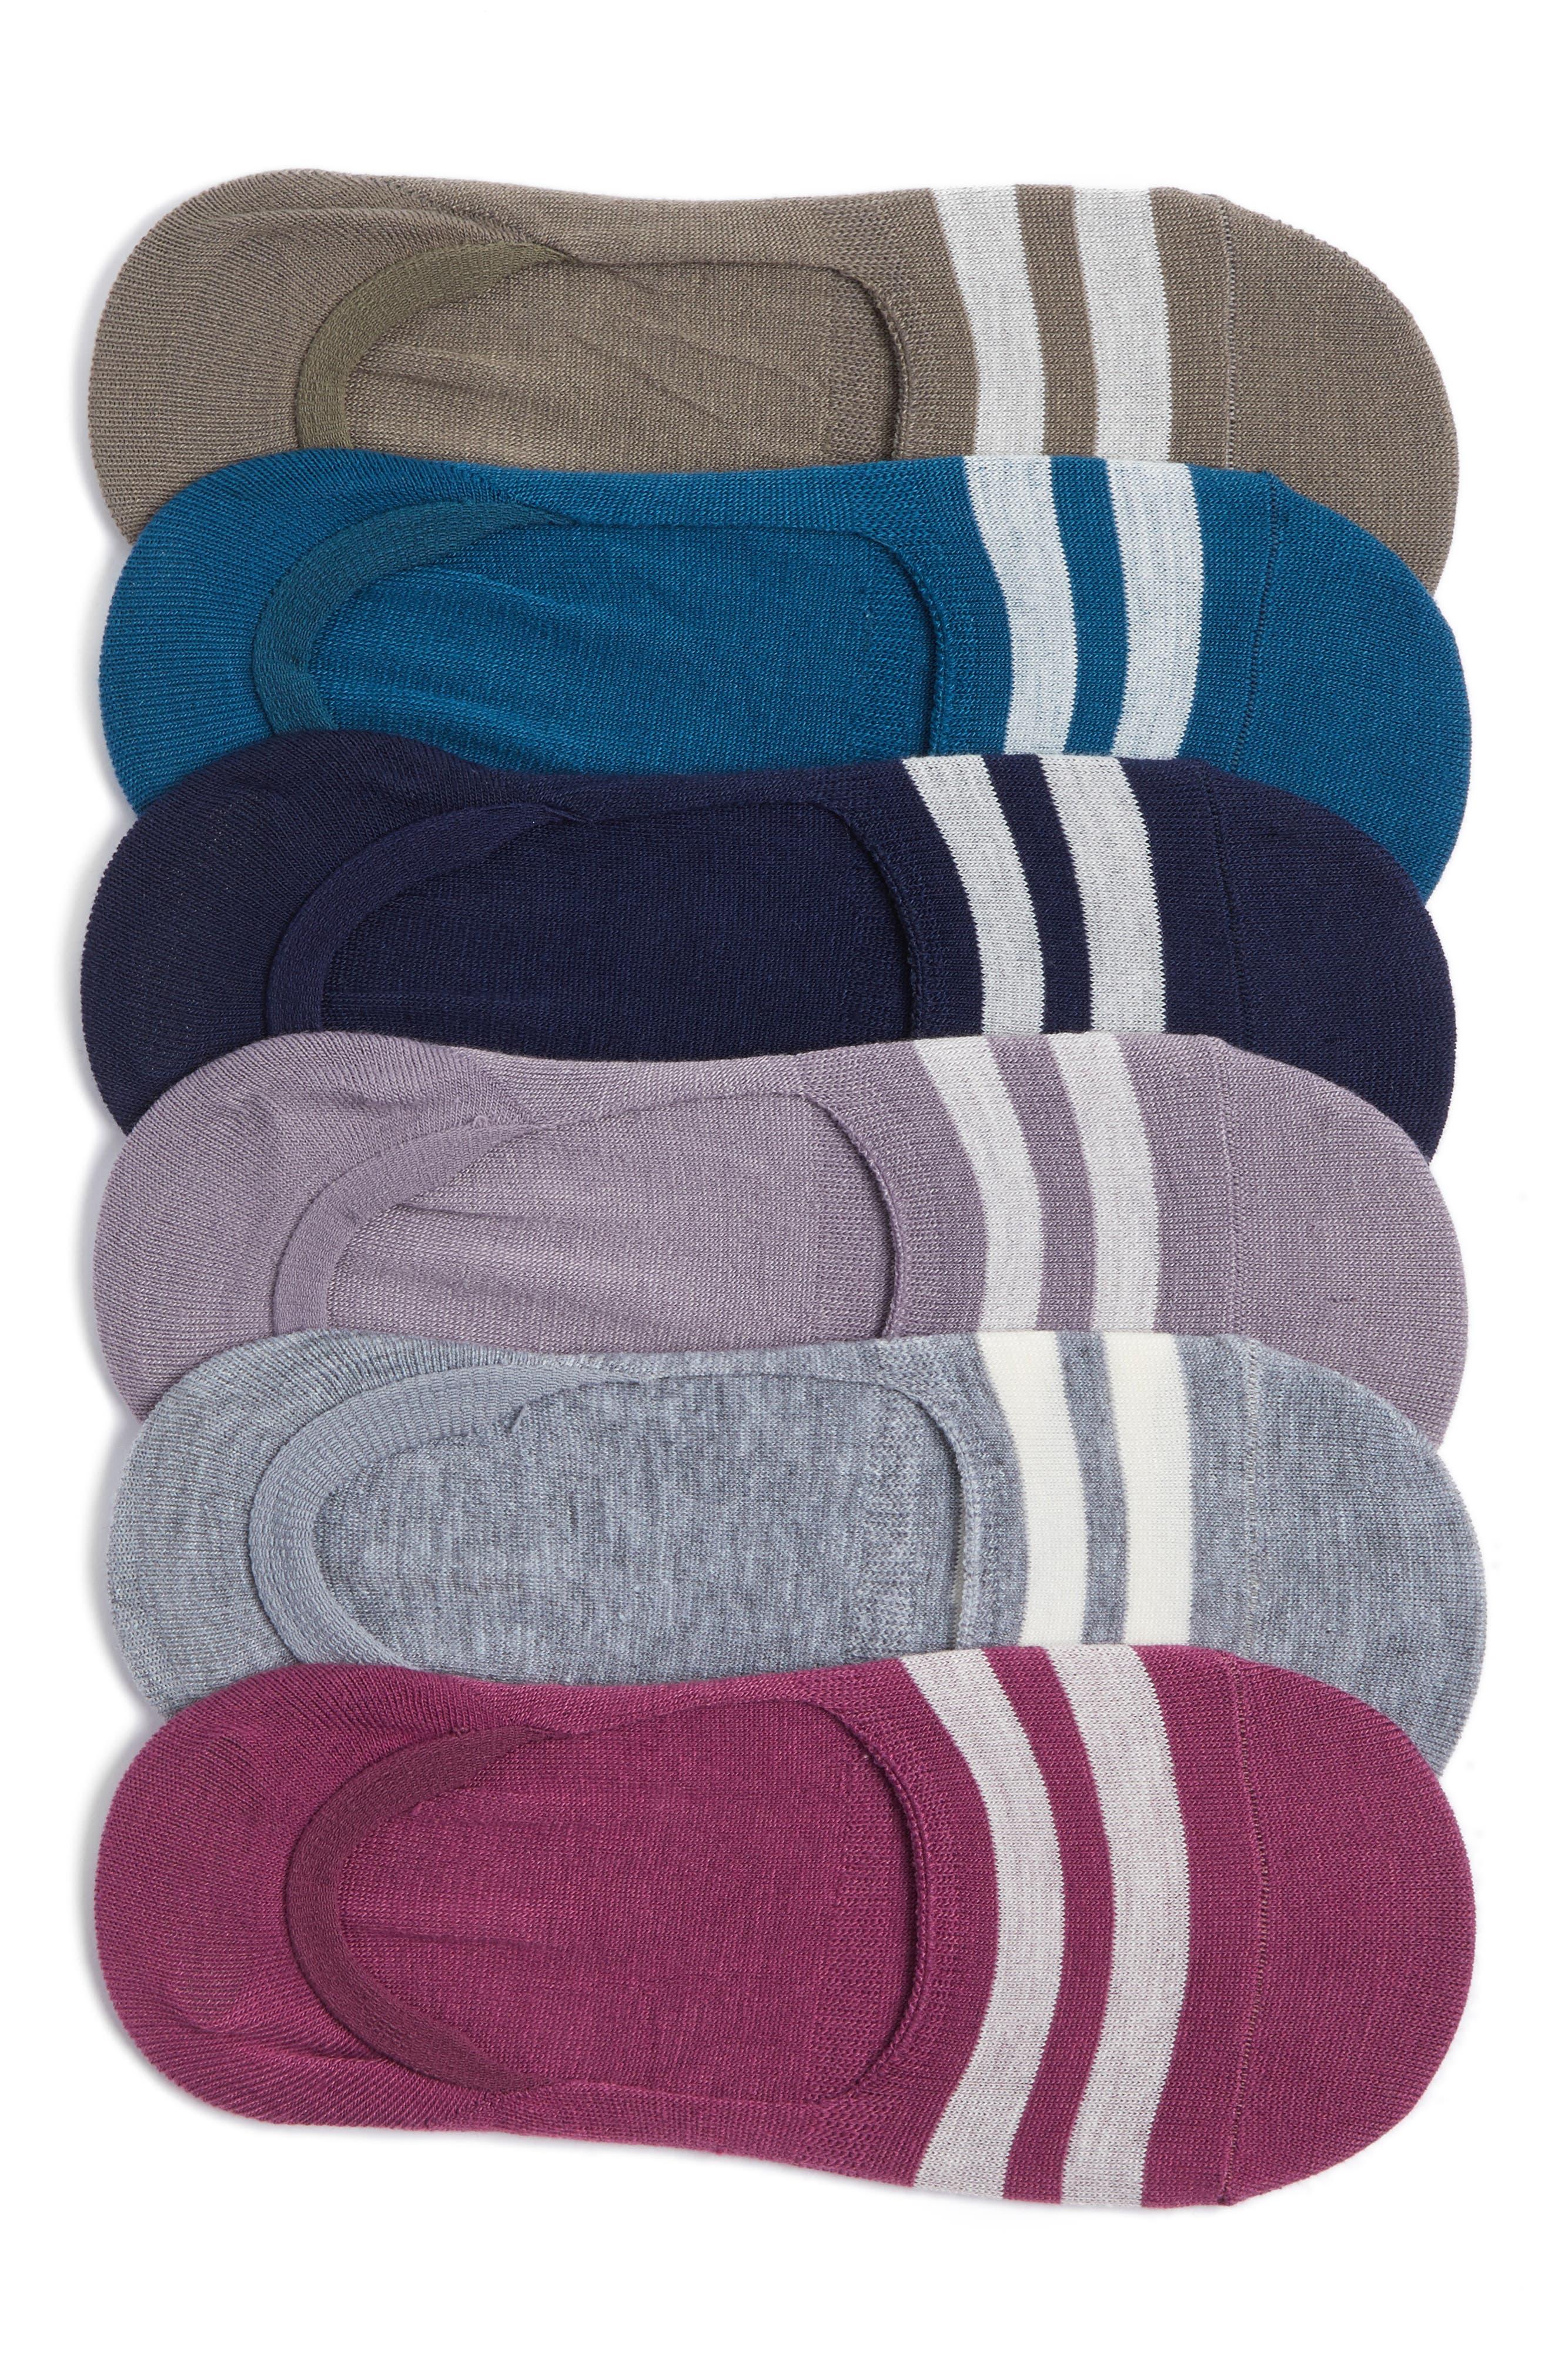 Varsity Stripe No-Show Socks,                             Main thumbnail 1, color,                             020